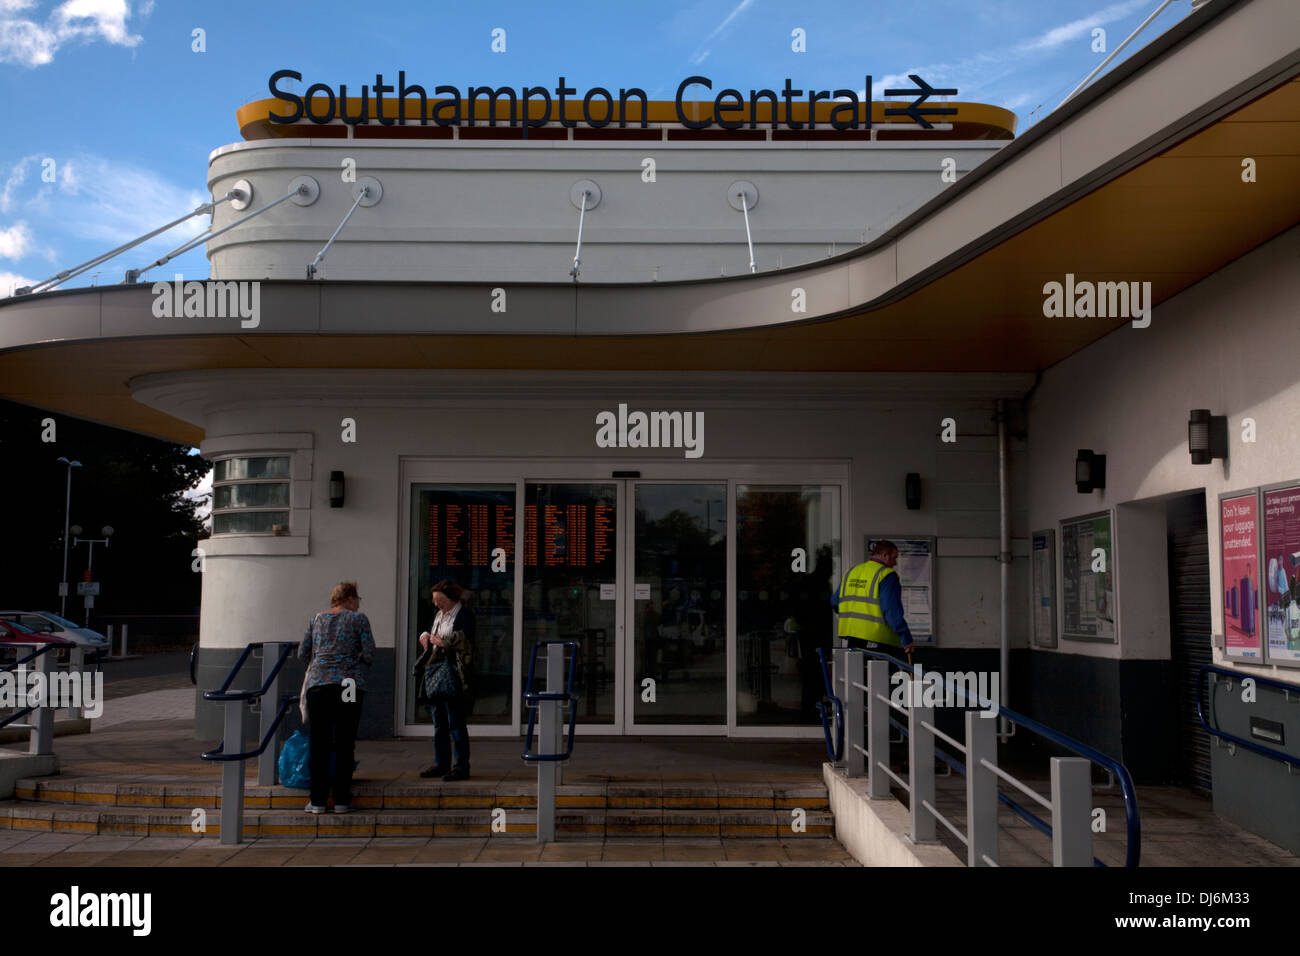 southampton central railway station southampton hampshire england - Stock Image